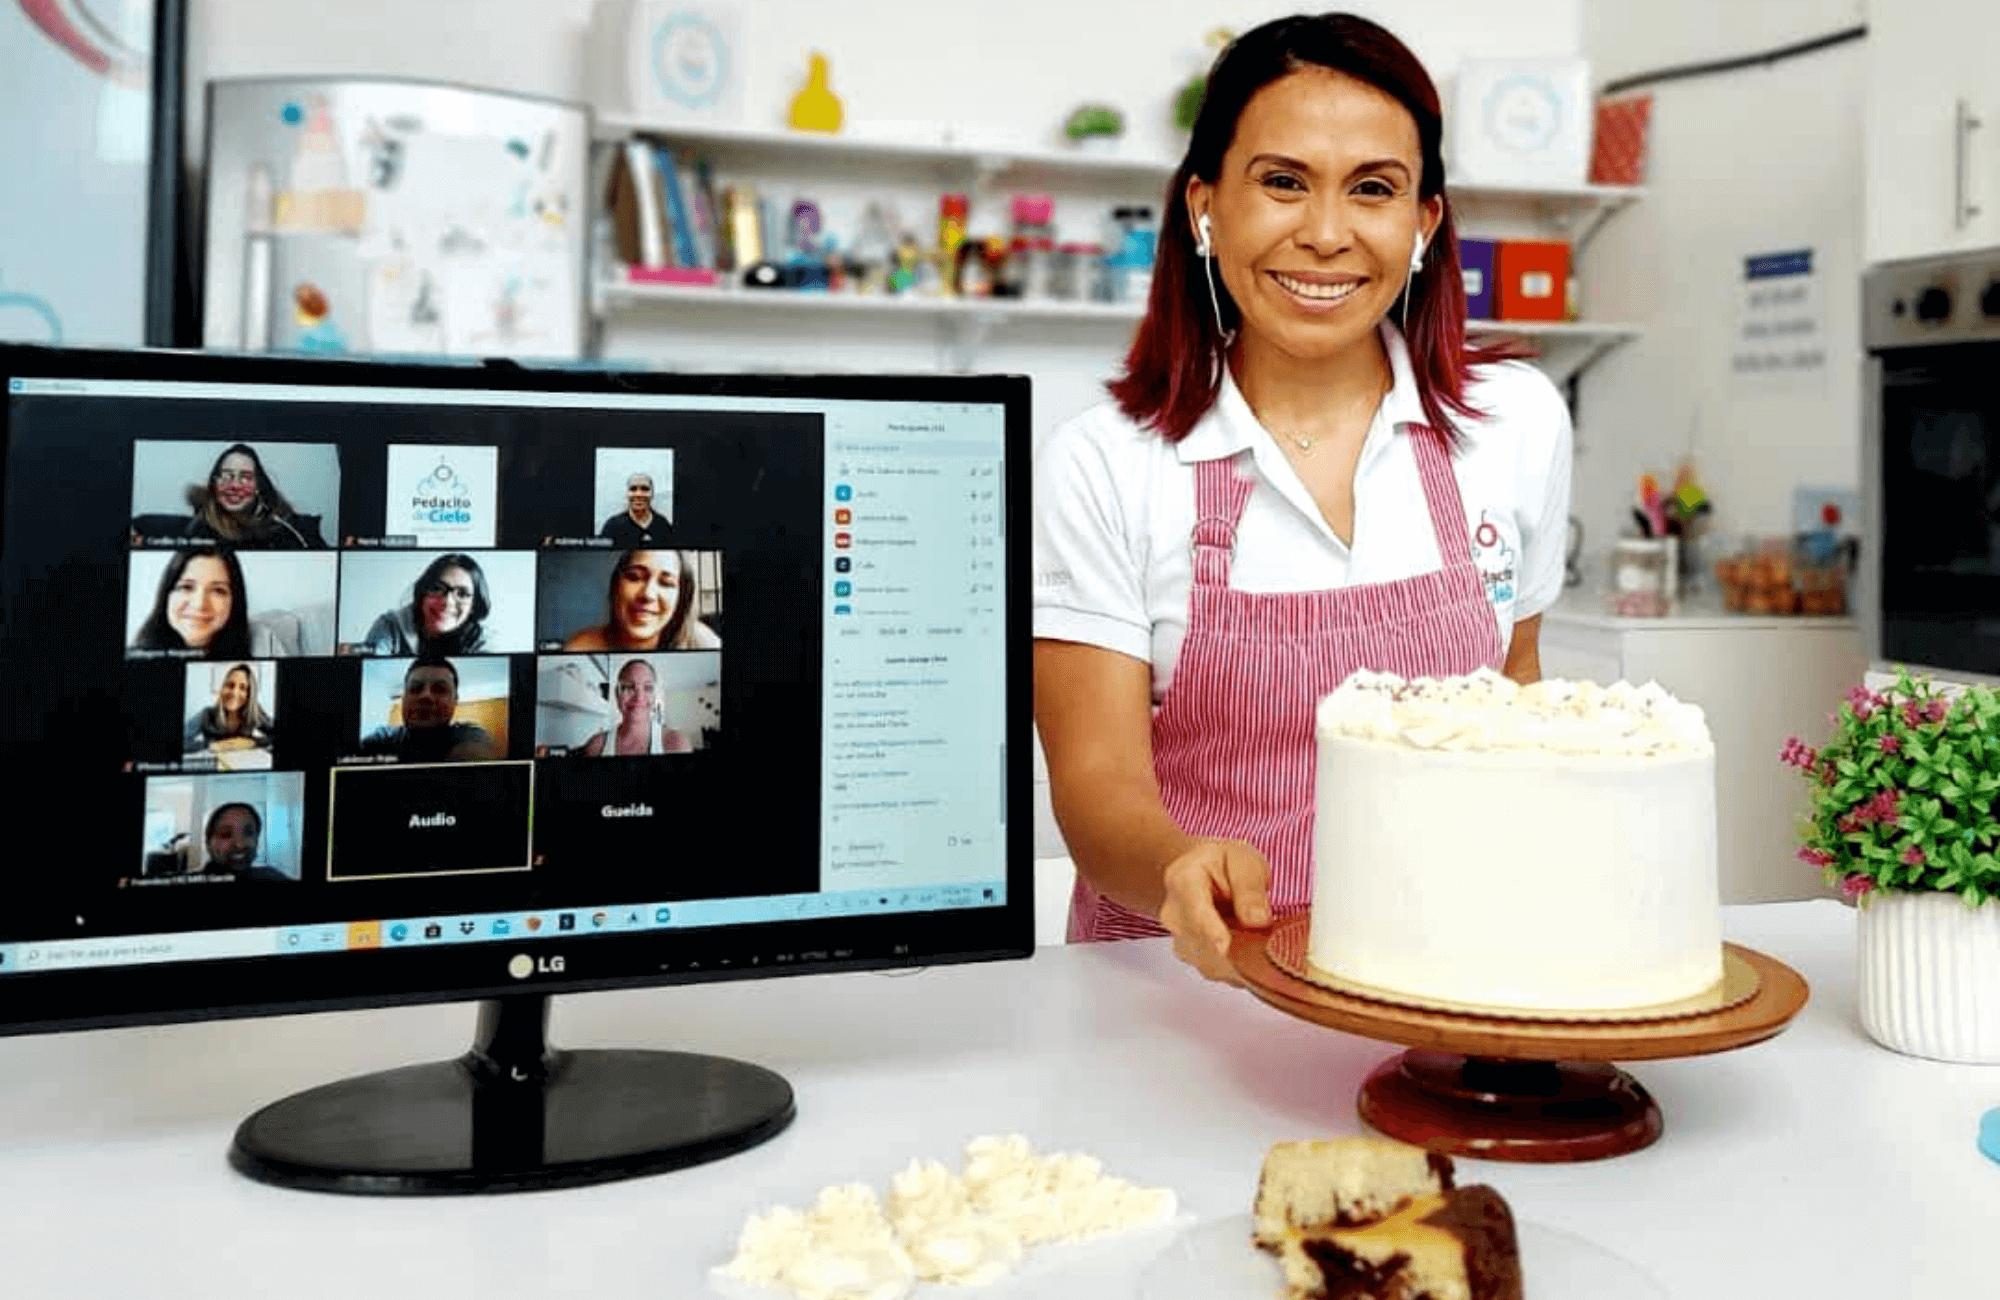 Talleres Online de reposteria artesanal de pasteles de buttercream y ganache de chocolate, decoracion de pasteles